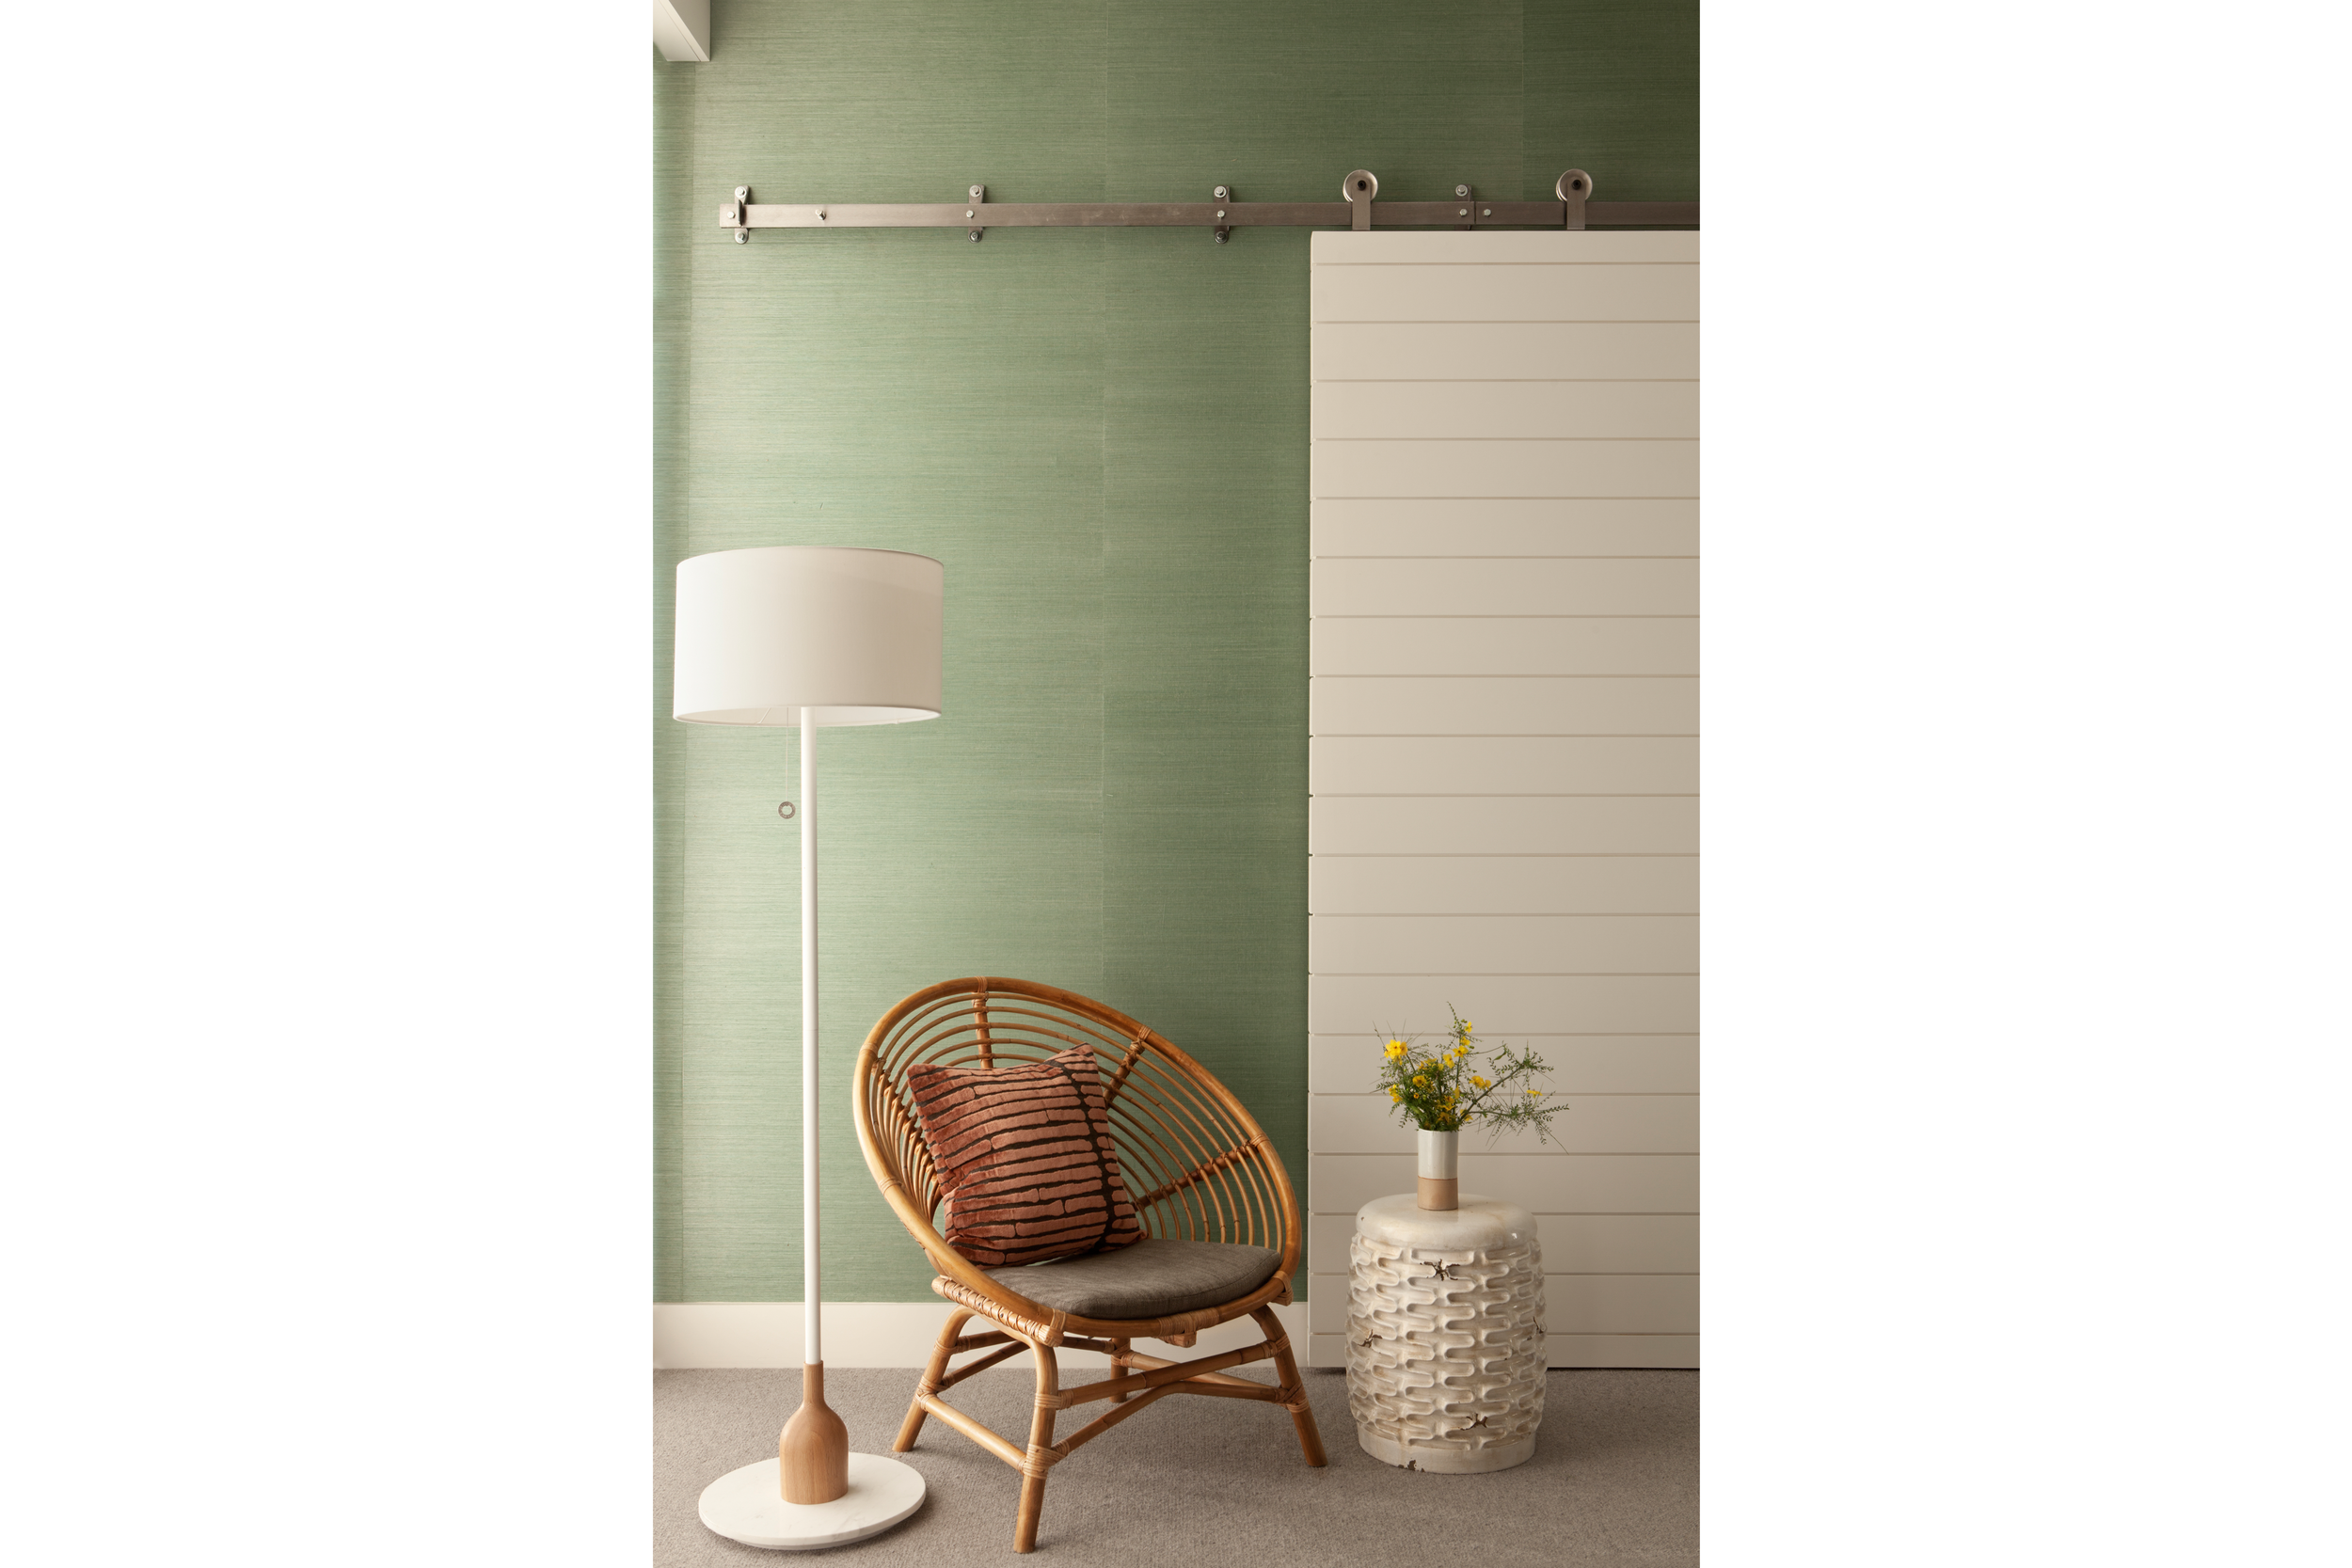 brittany stiles design green grasscloth barn door.png